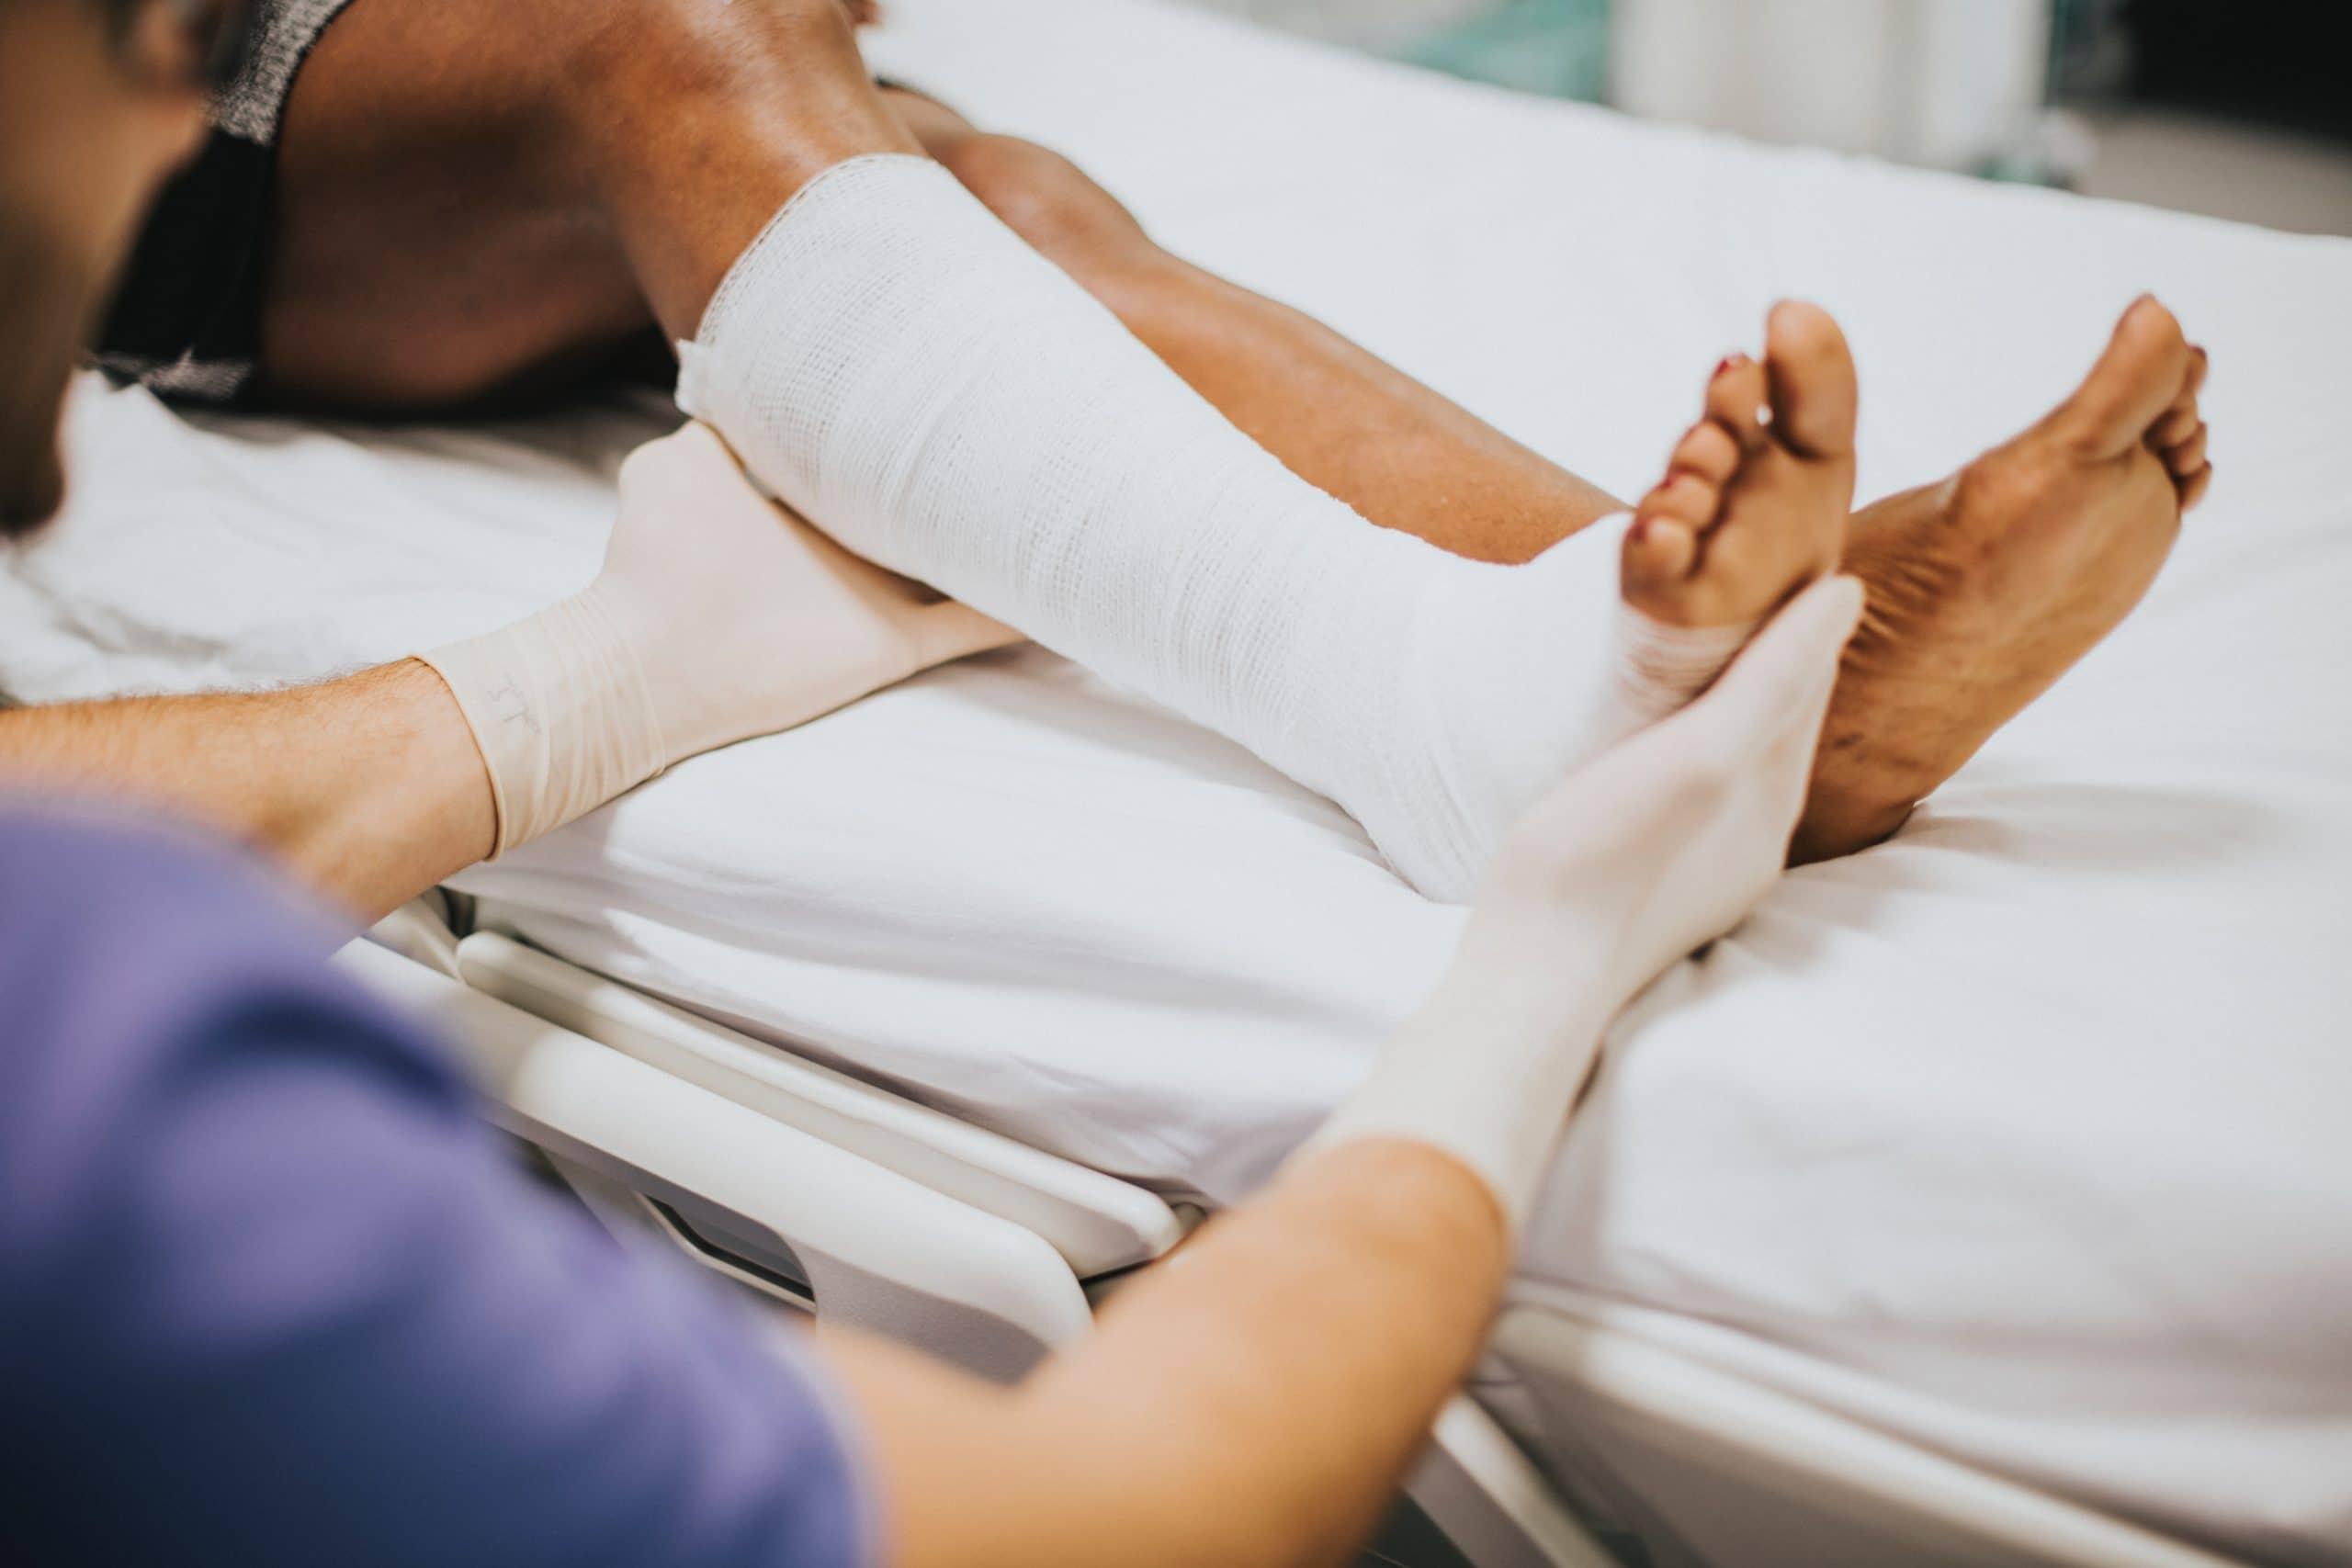 Personal leg injury